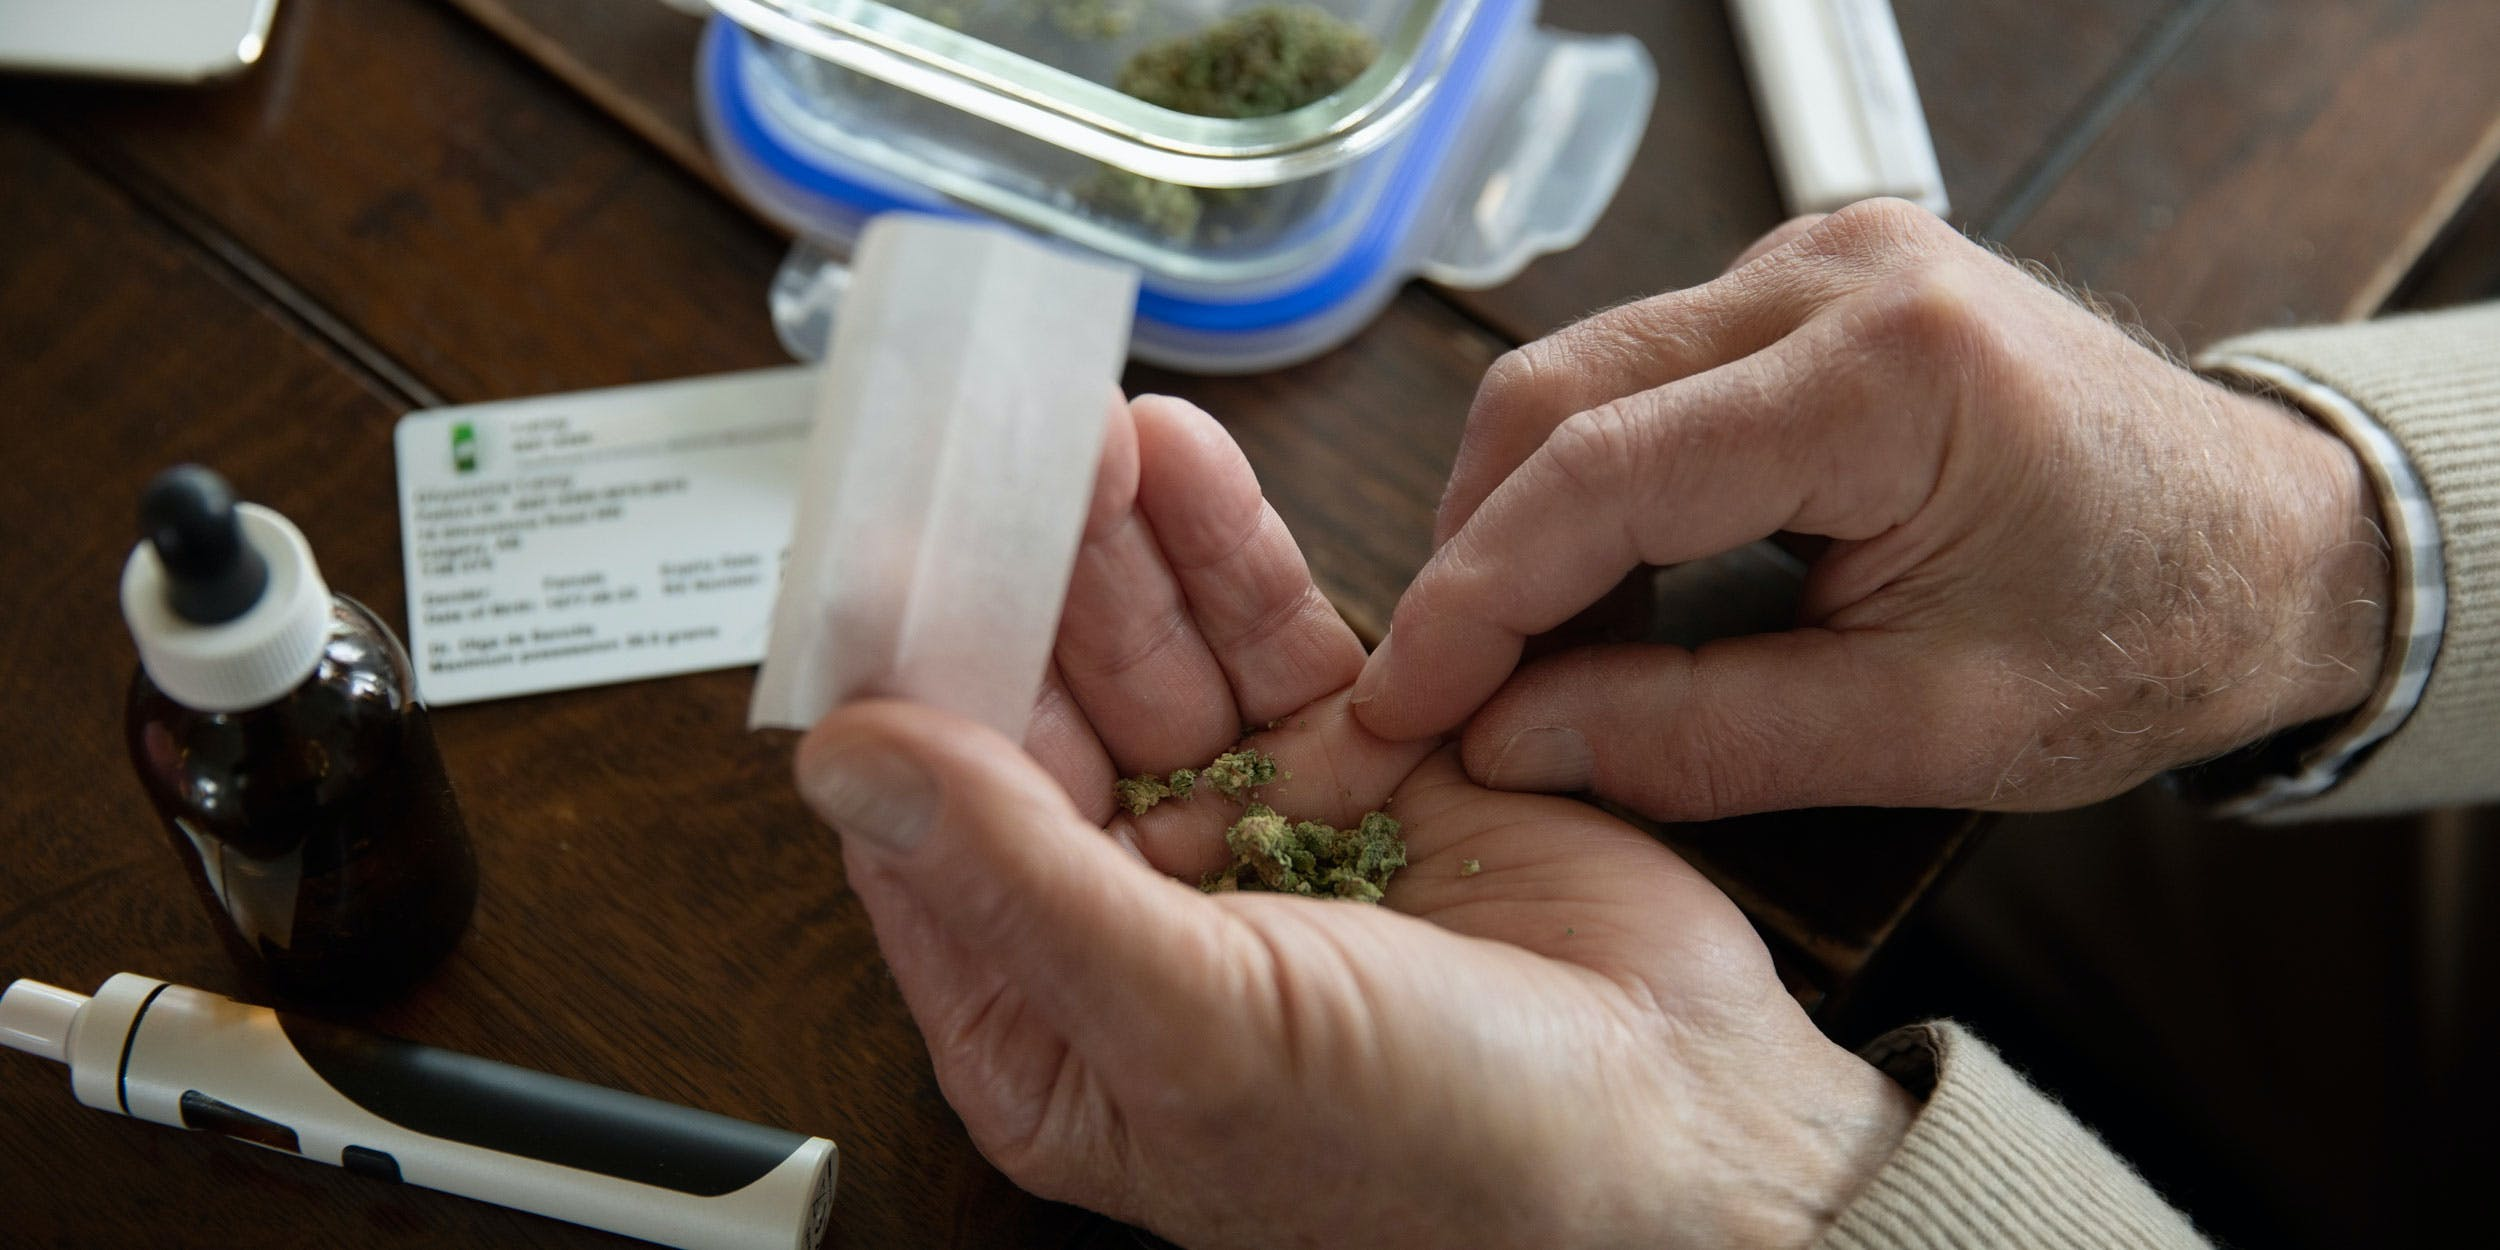 Medical Marijuana in an old mans hands next to cbd oil and a vaporizer